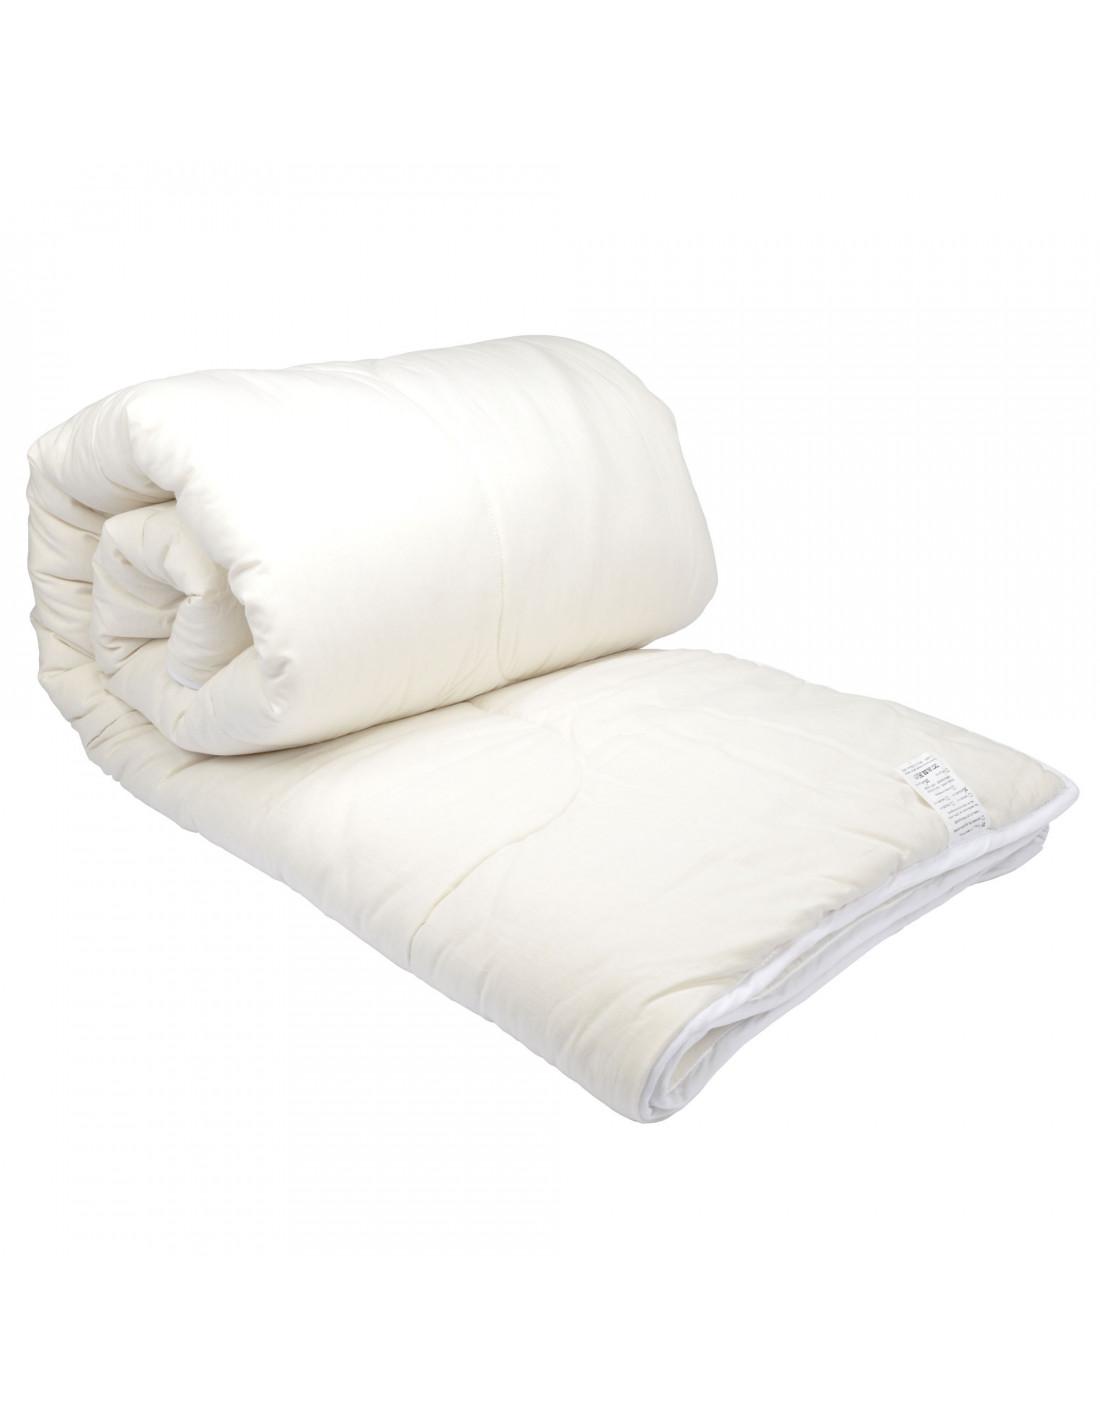 couette t noct a inga noct a. Black Bedroom Furniture Sets. Home Design Ideas